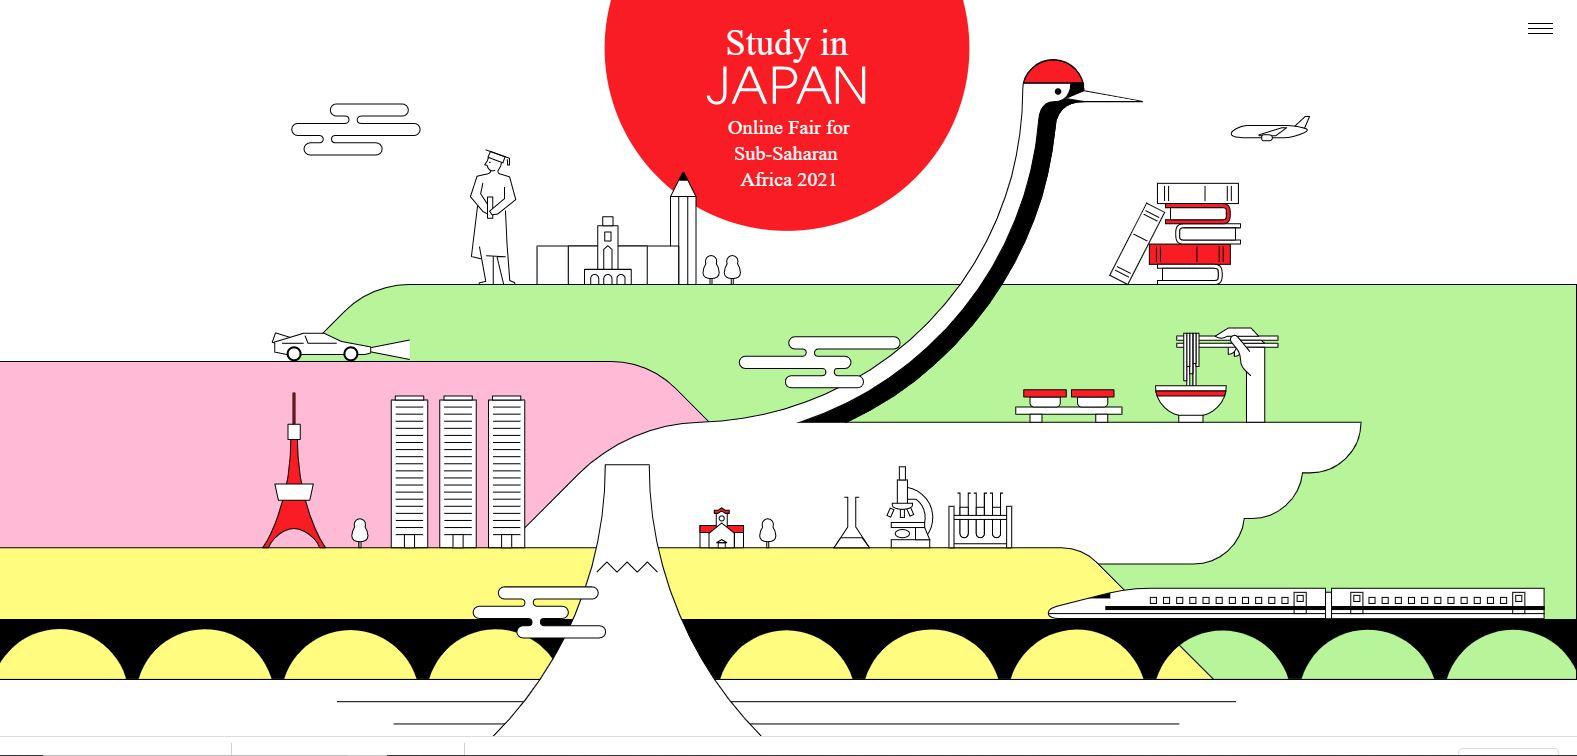 Study in JAPAN Online Fair for Sub-Saharan Africa 2021